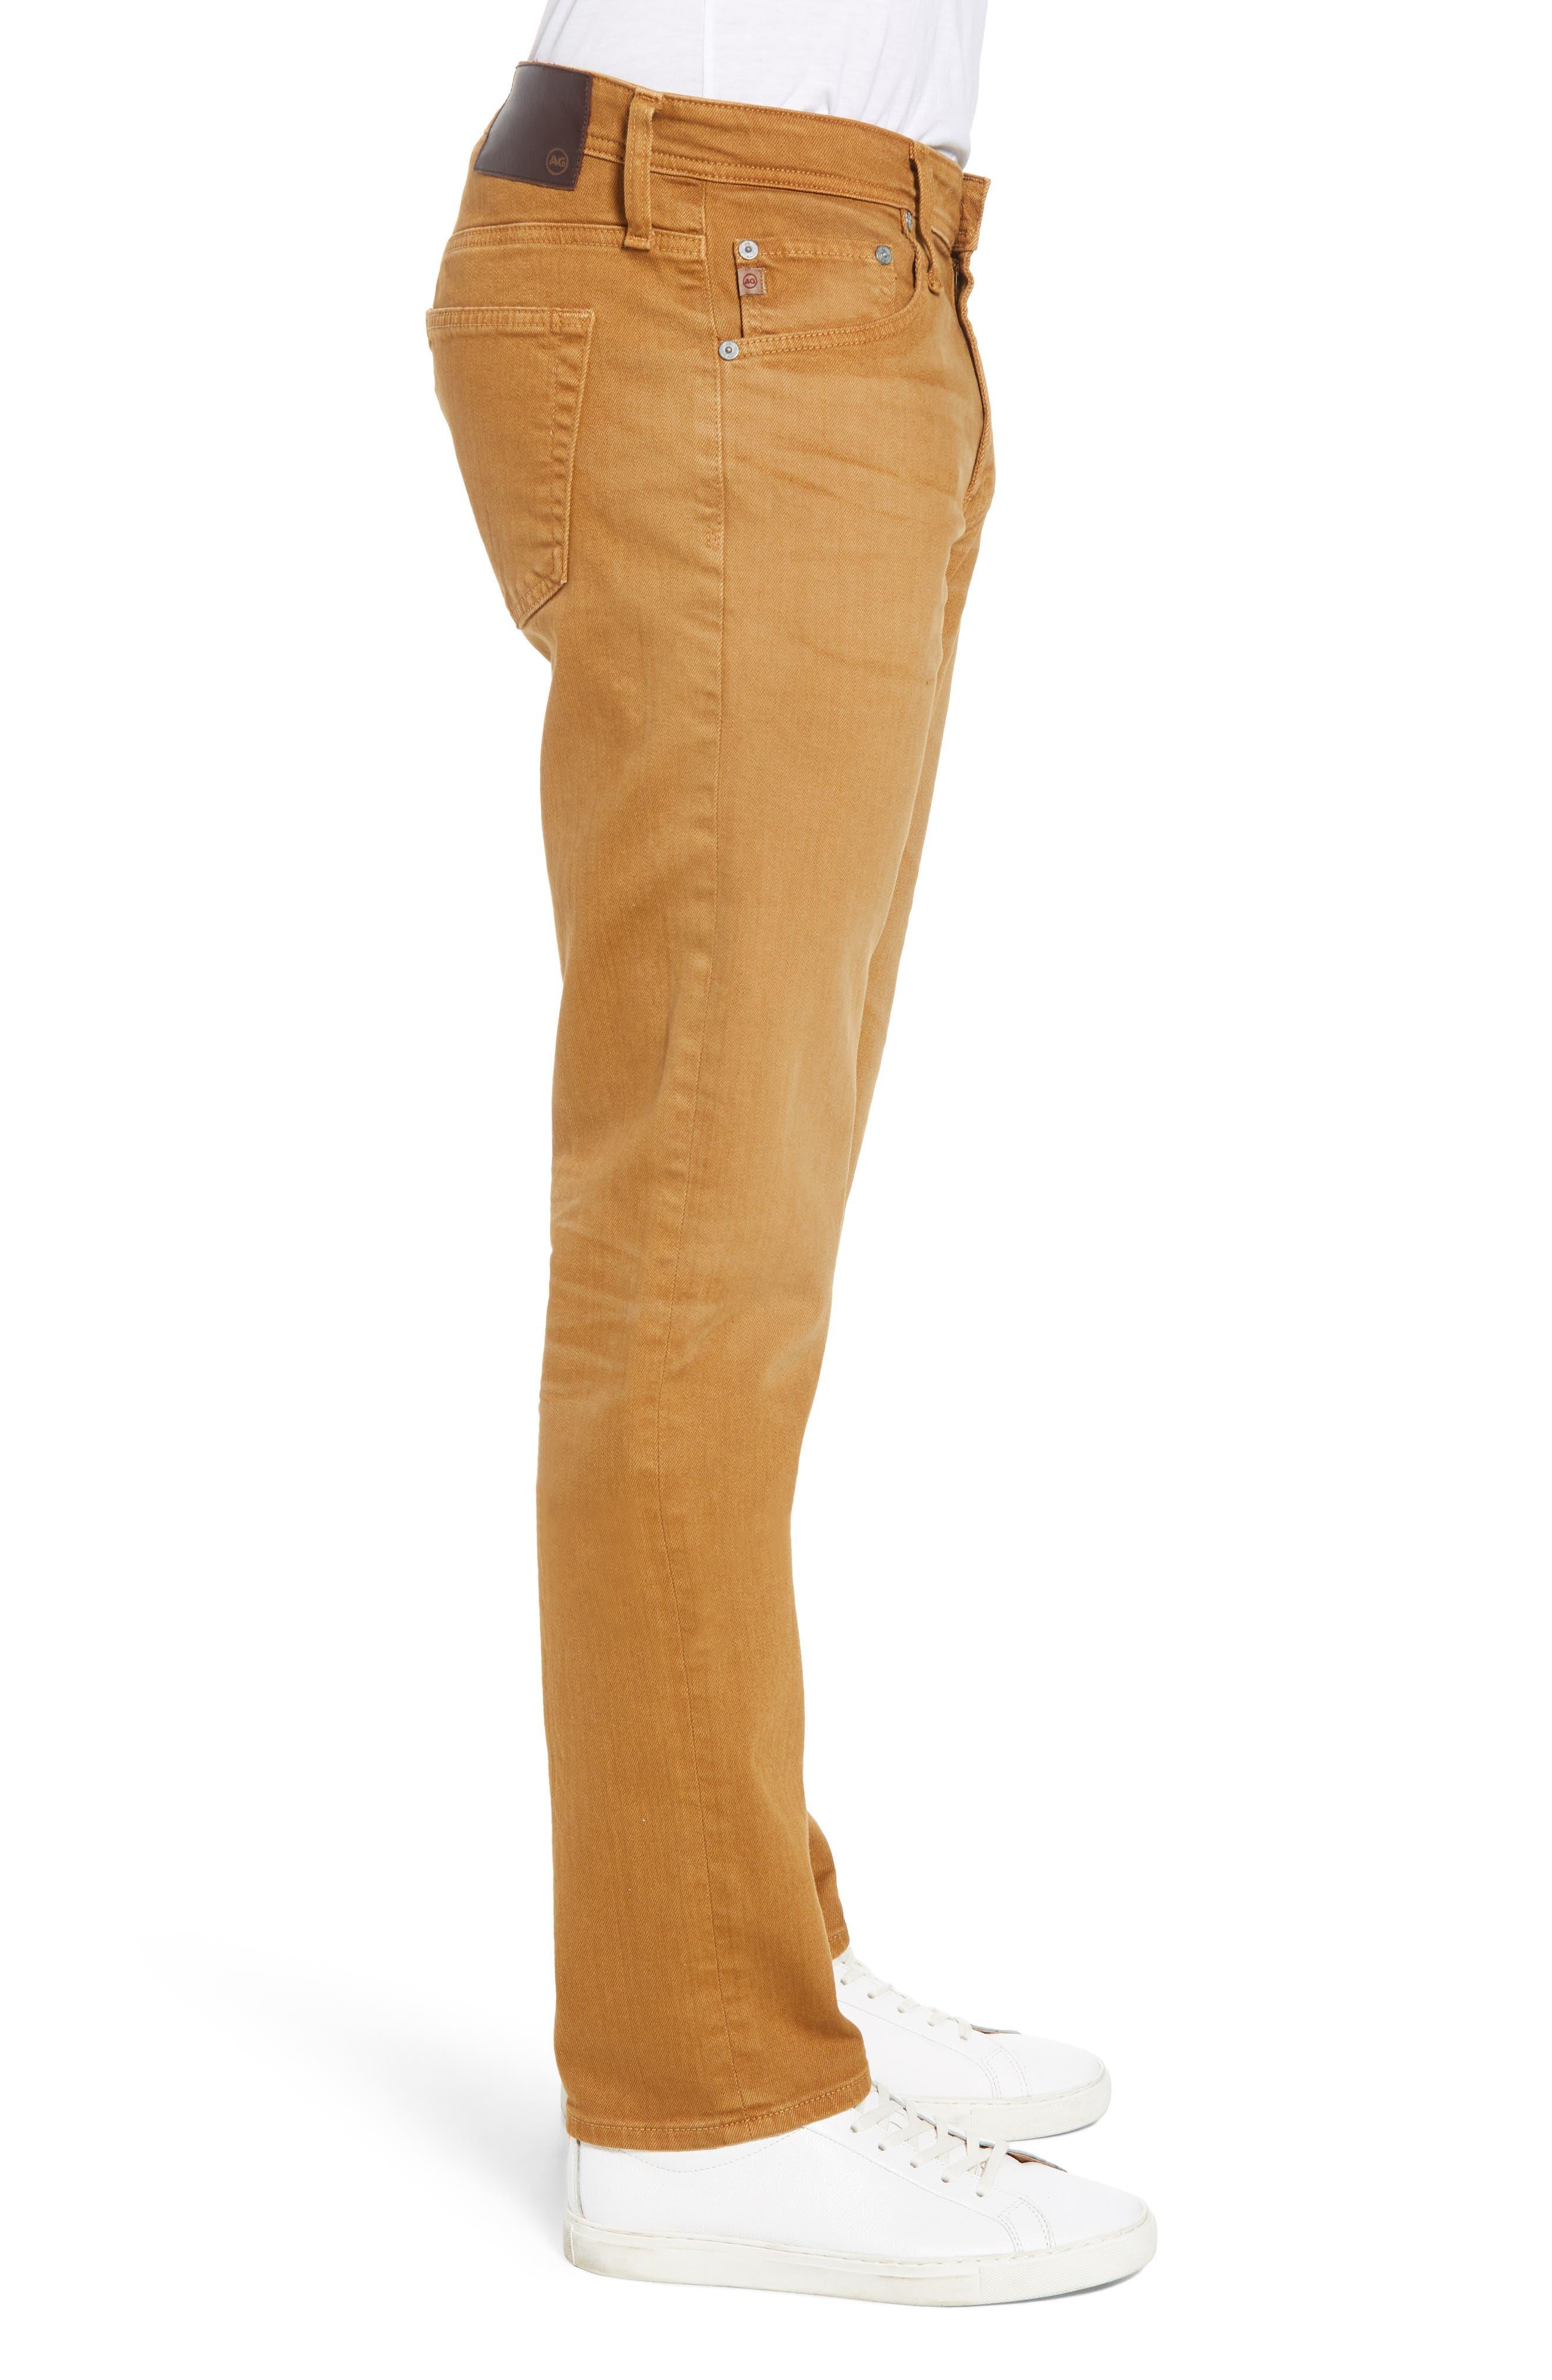 Tellis Slim Fit Jeans,                             Alternate thumbnail 3, color,                             7 YEARS TIMBER